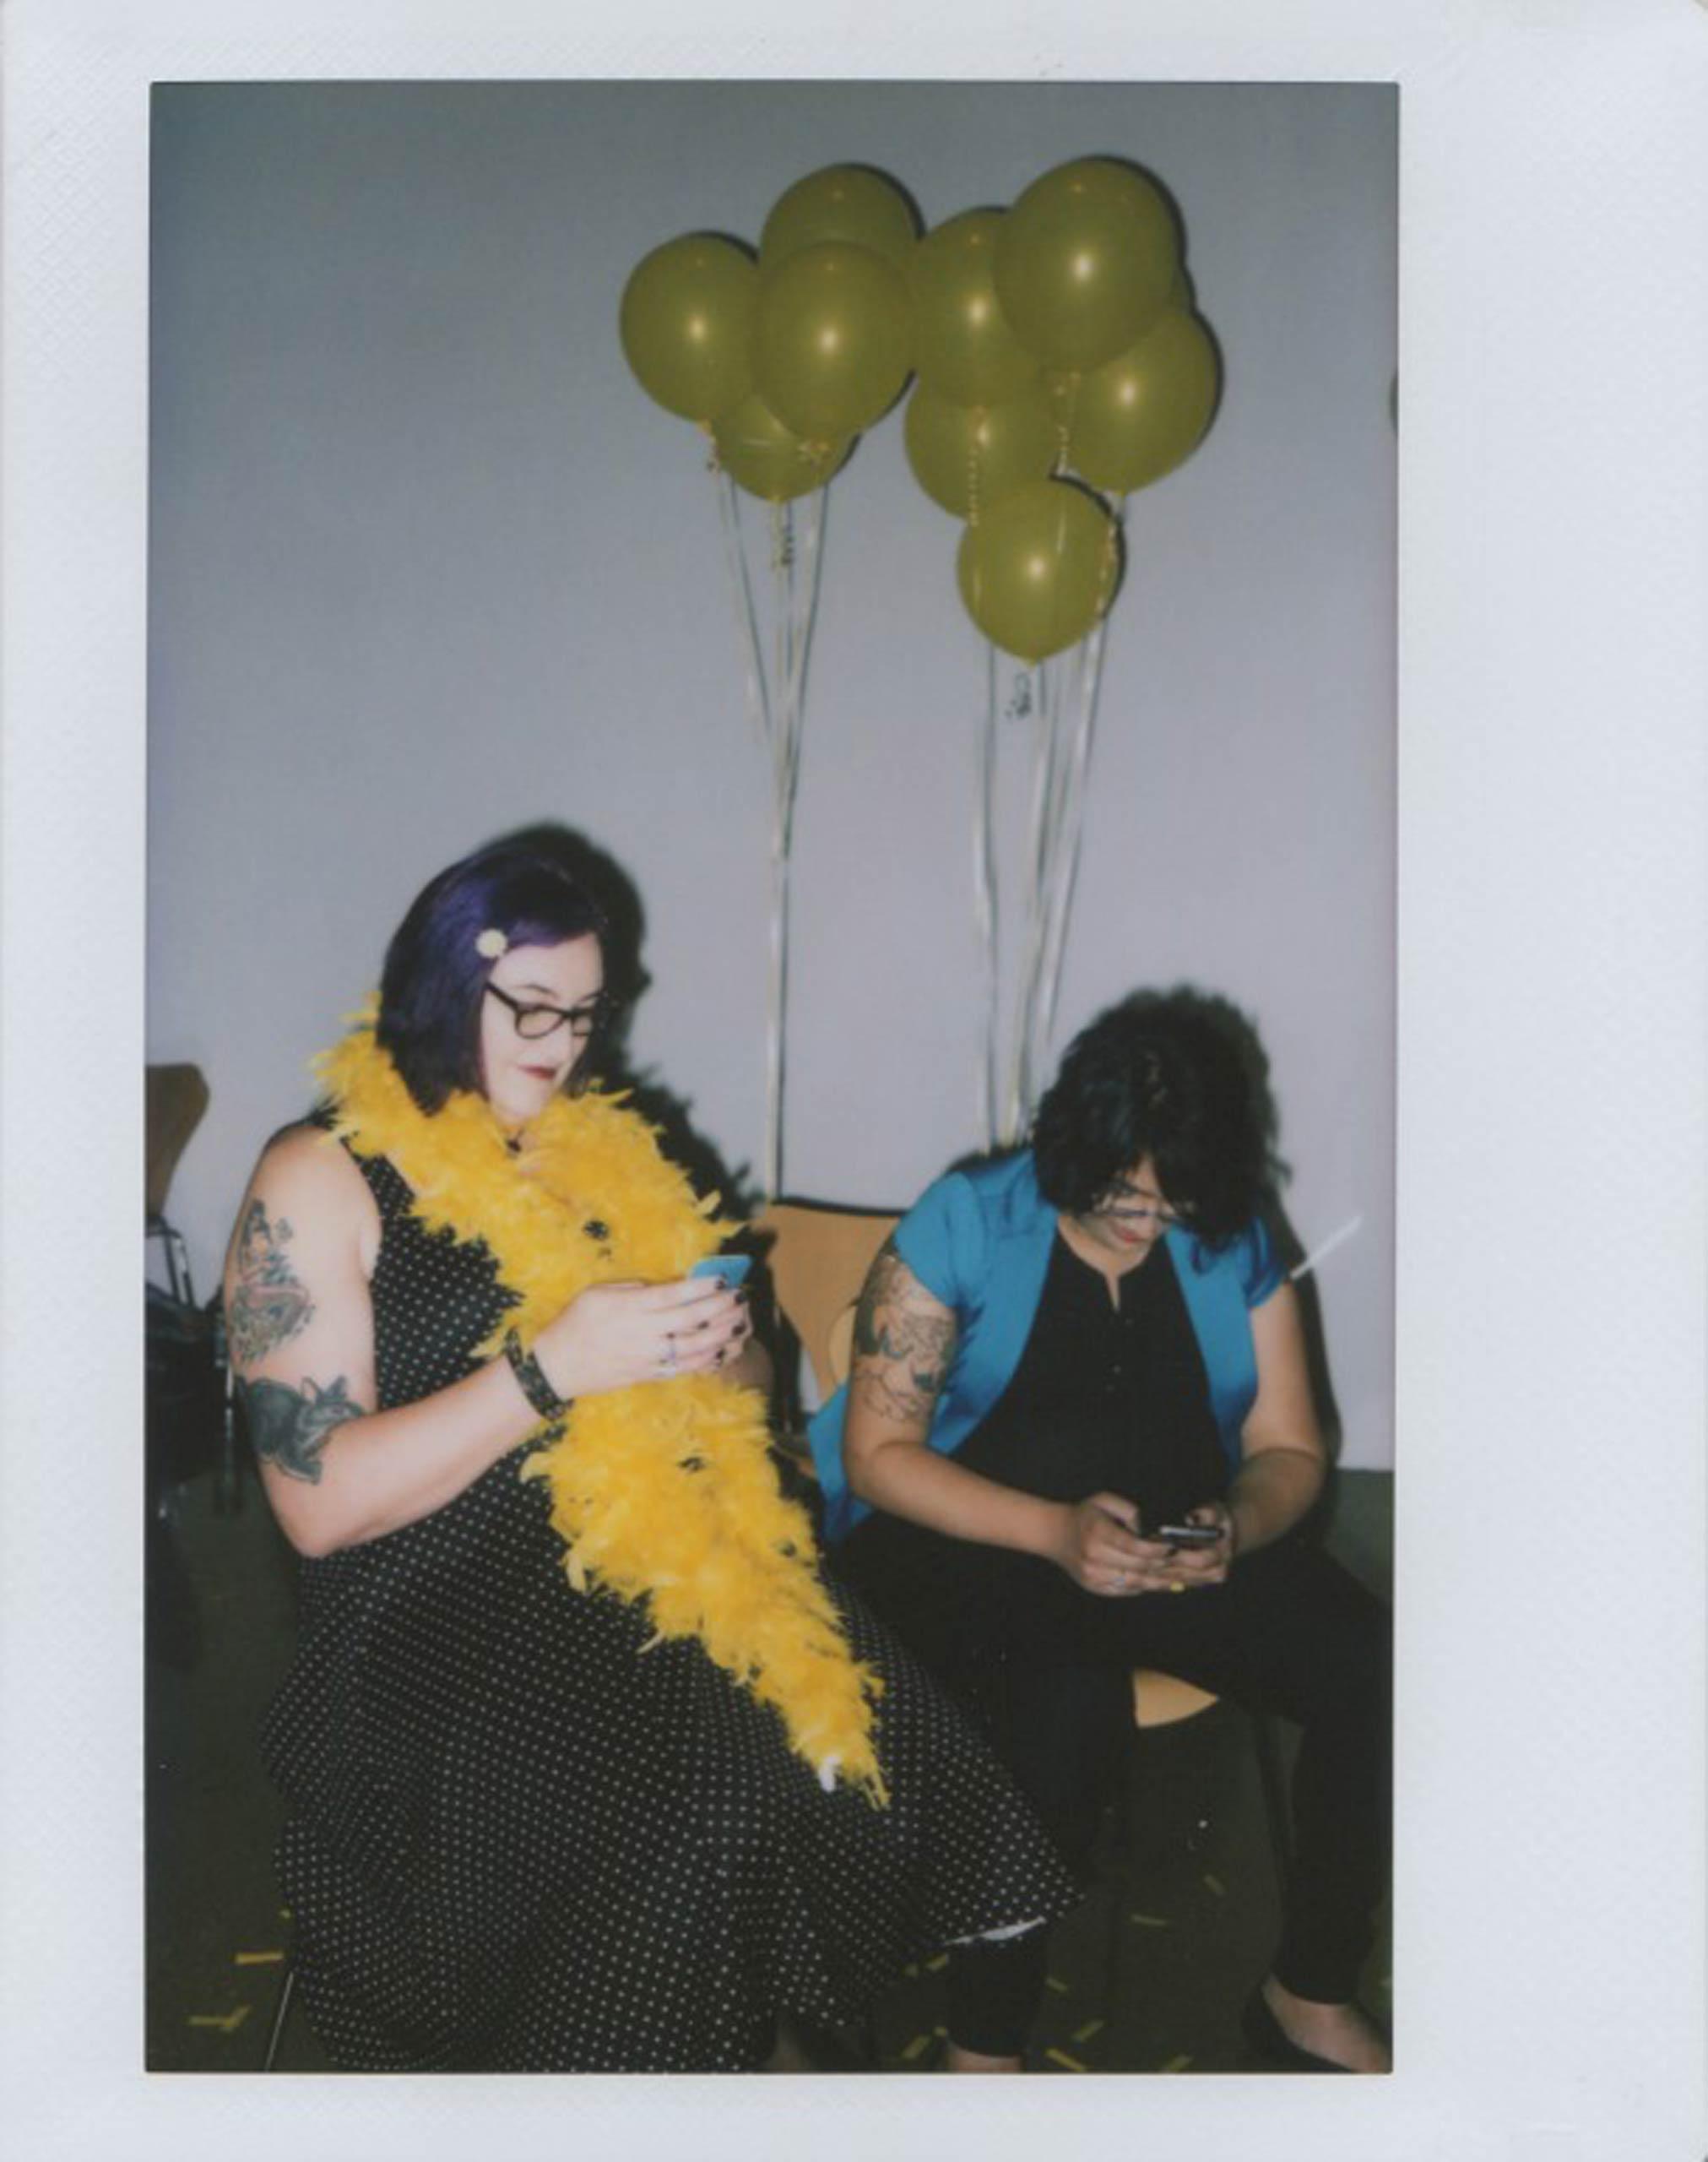 Greta Martela, left, and Nina Chaubal check their phones at the #InstaPride photo shoot in Hollywood, Calif., on May 22, 2015.